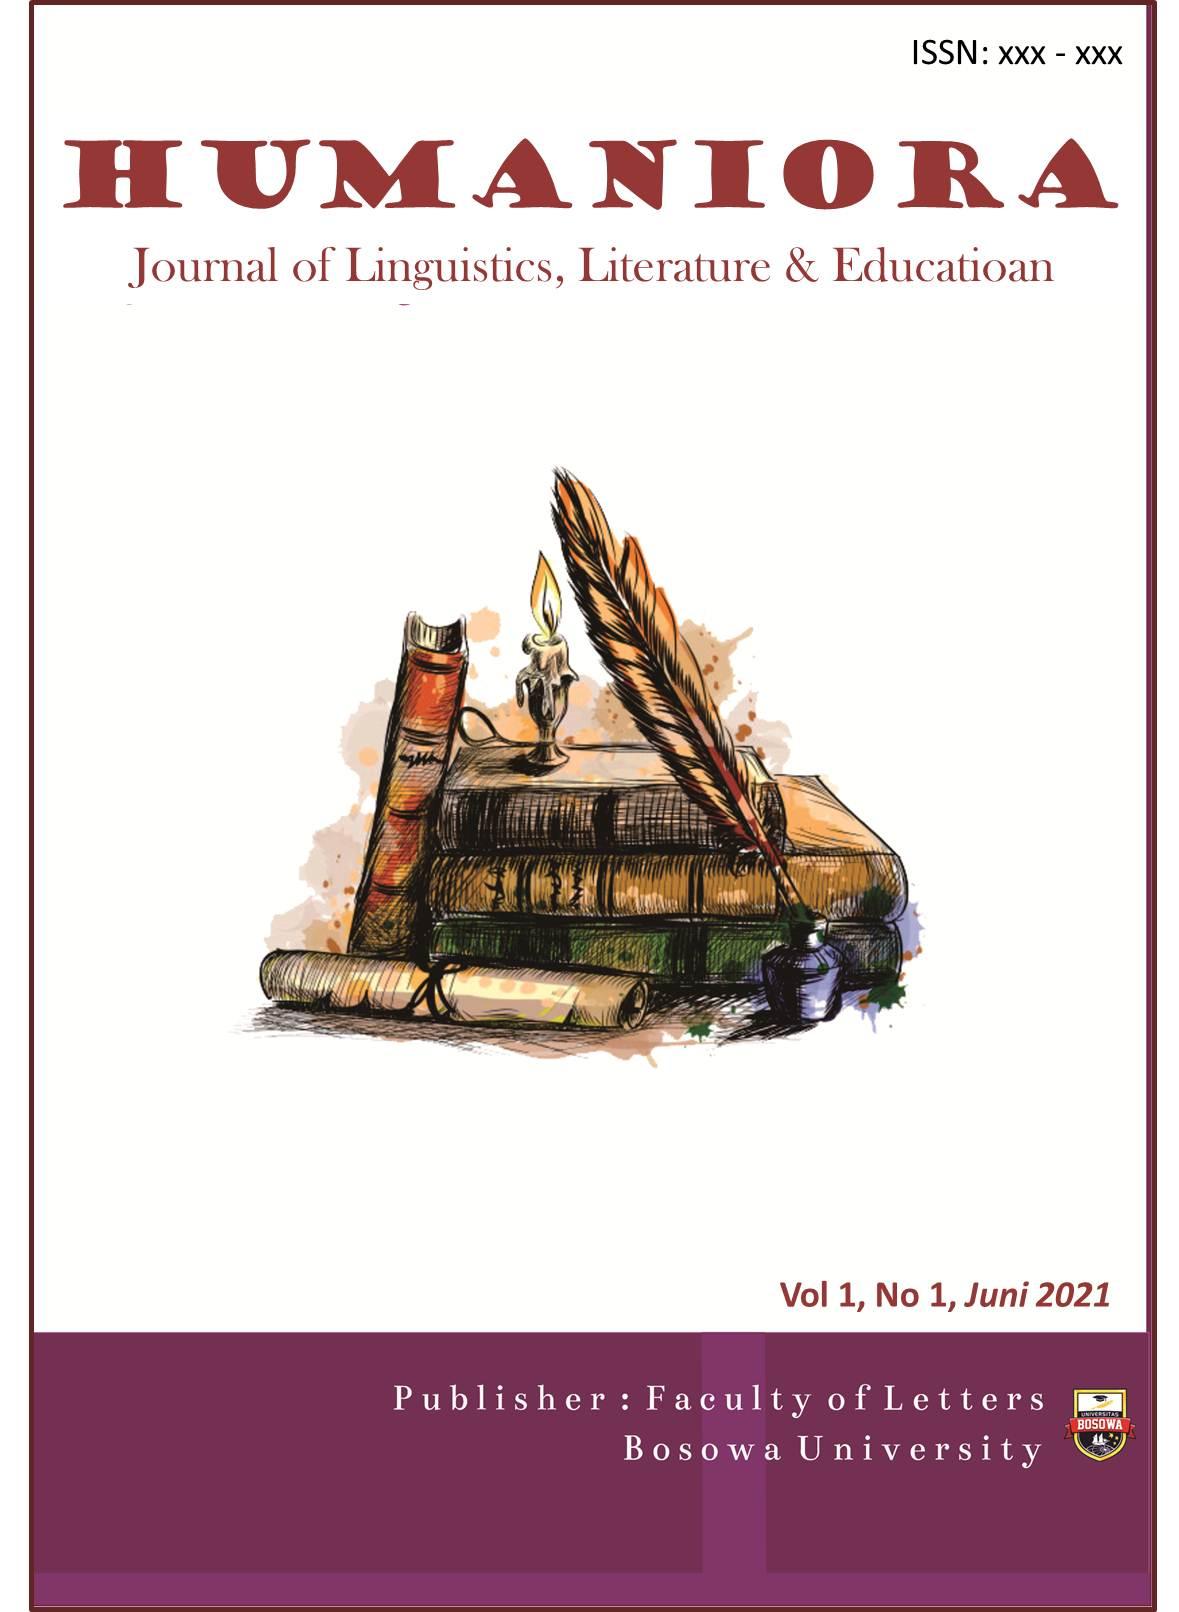 View Vol. 1 No. 1 (2021): HUMANIORA: Journal of Linguistics,  Literature and Education, Juni 2021